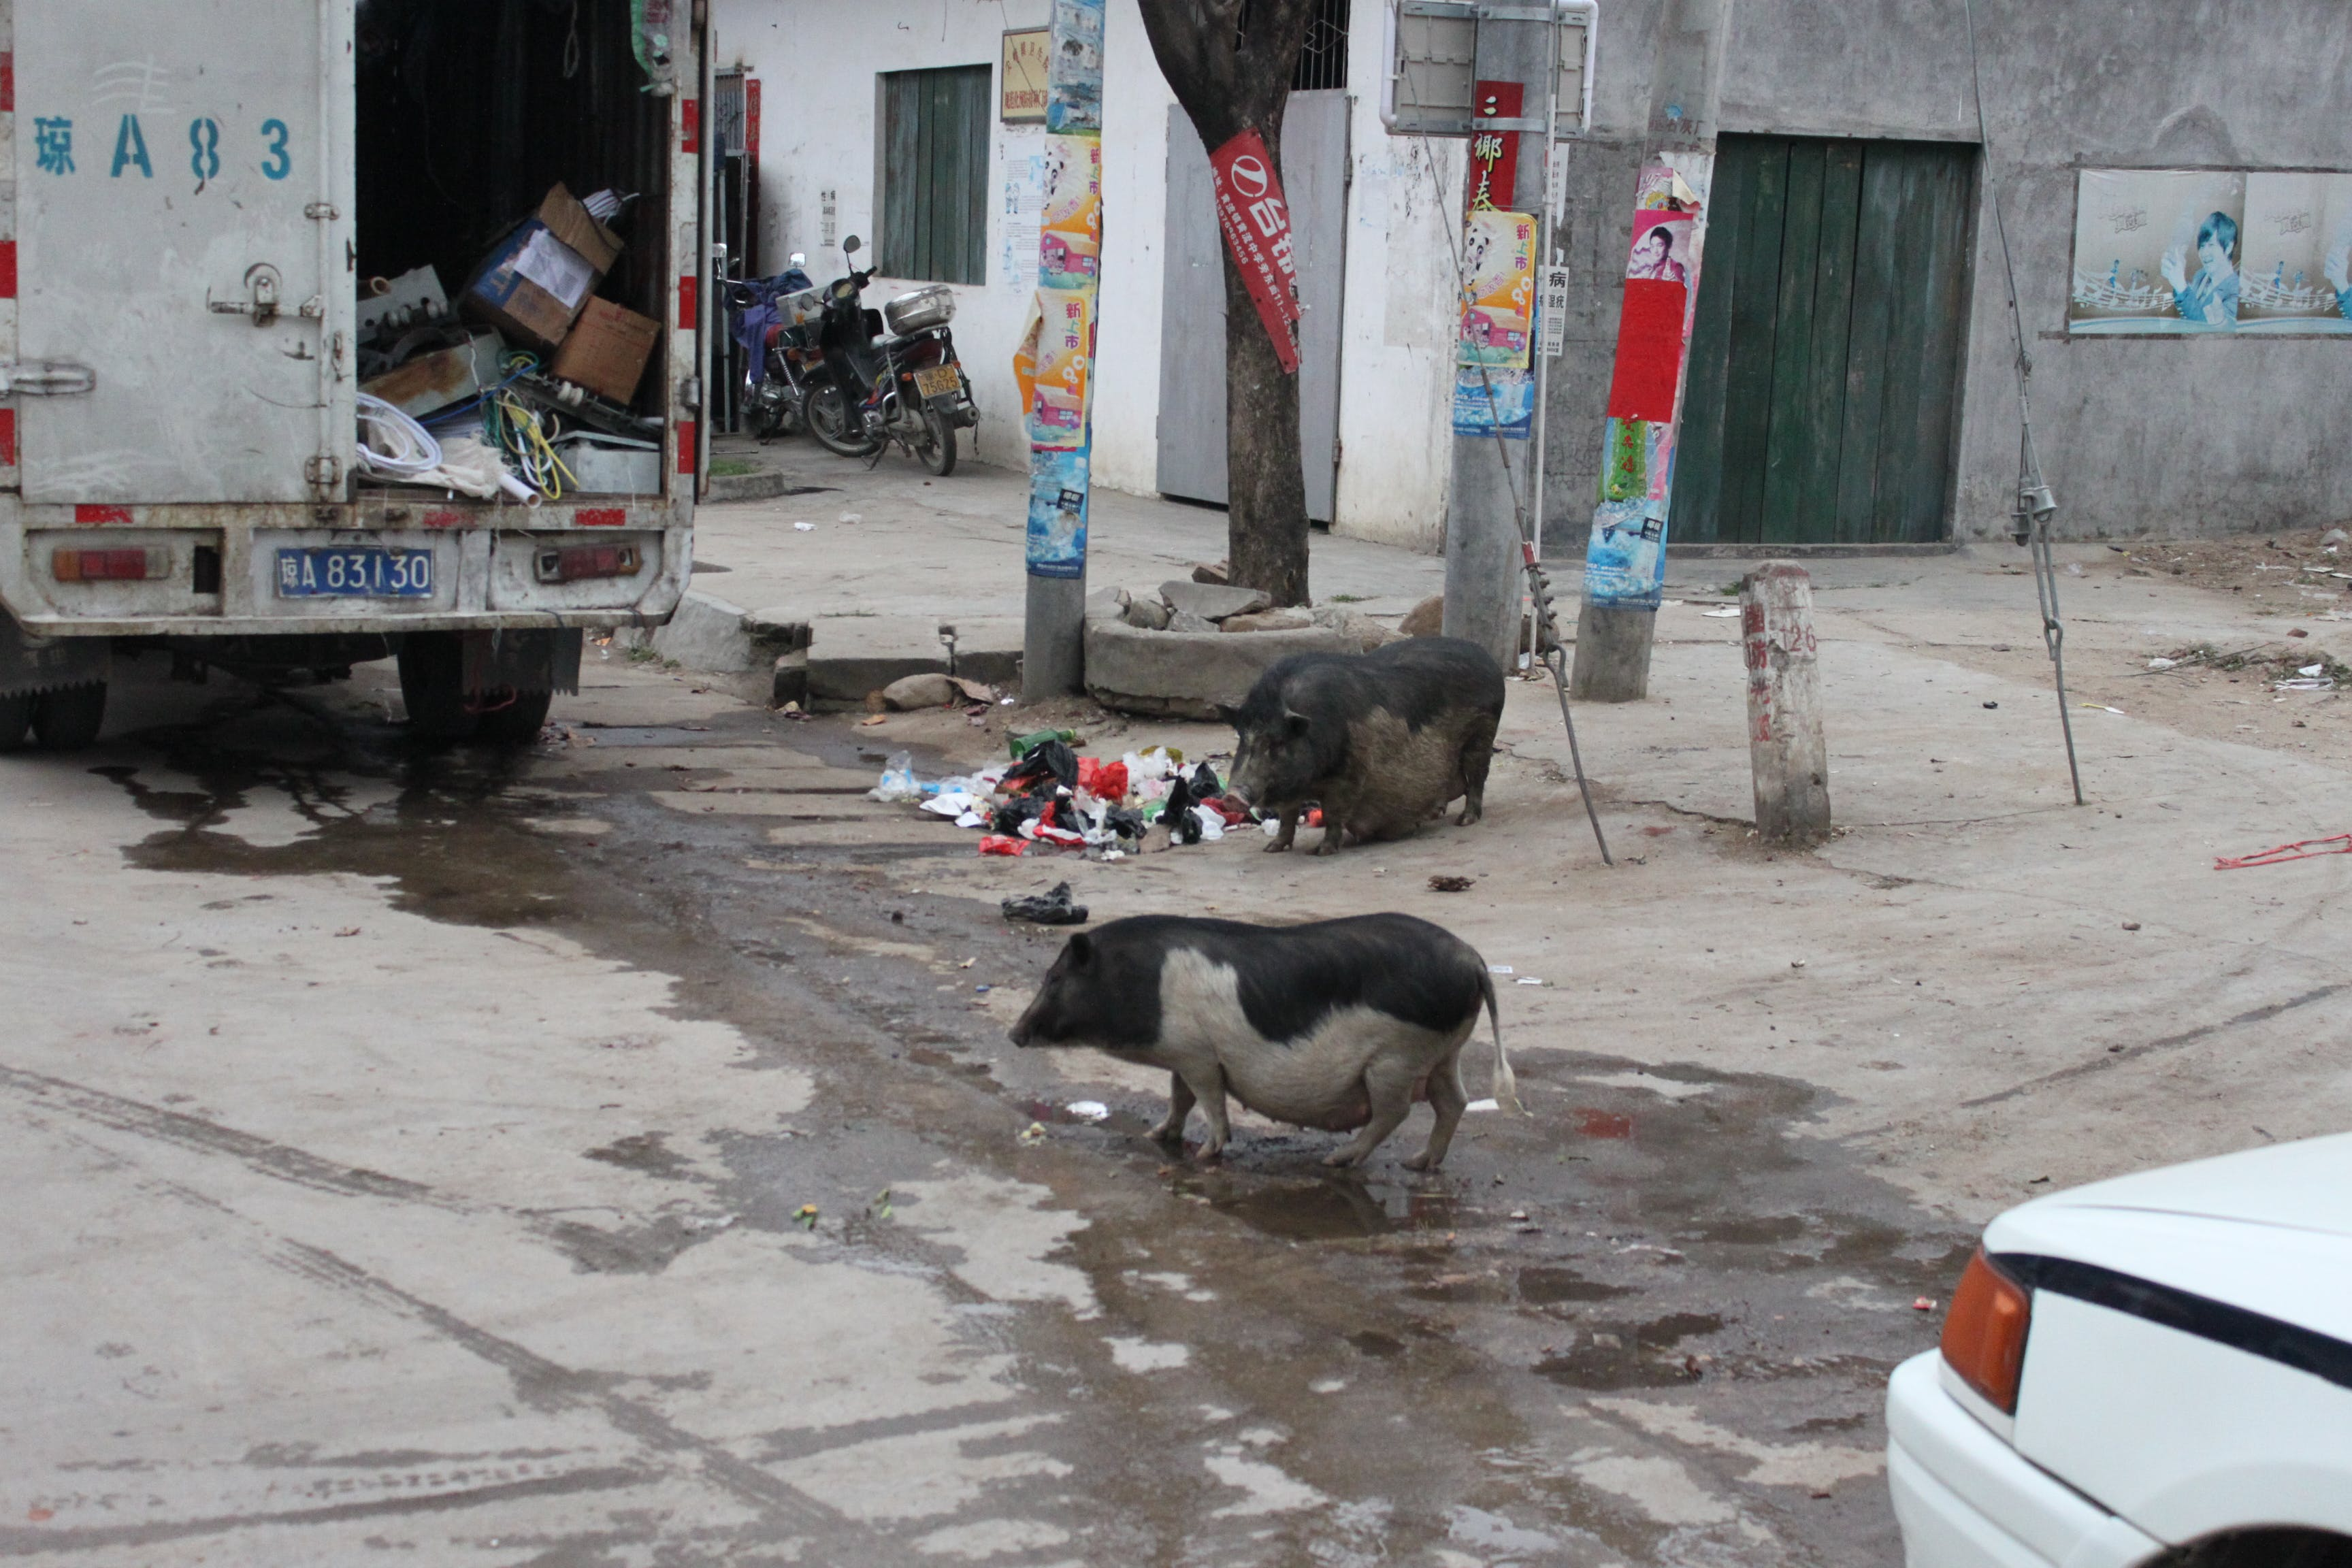 Foto stok gratis Cina, dianasilaraja, kehidupan kota